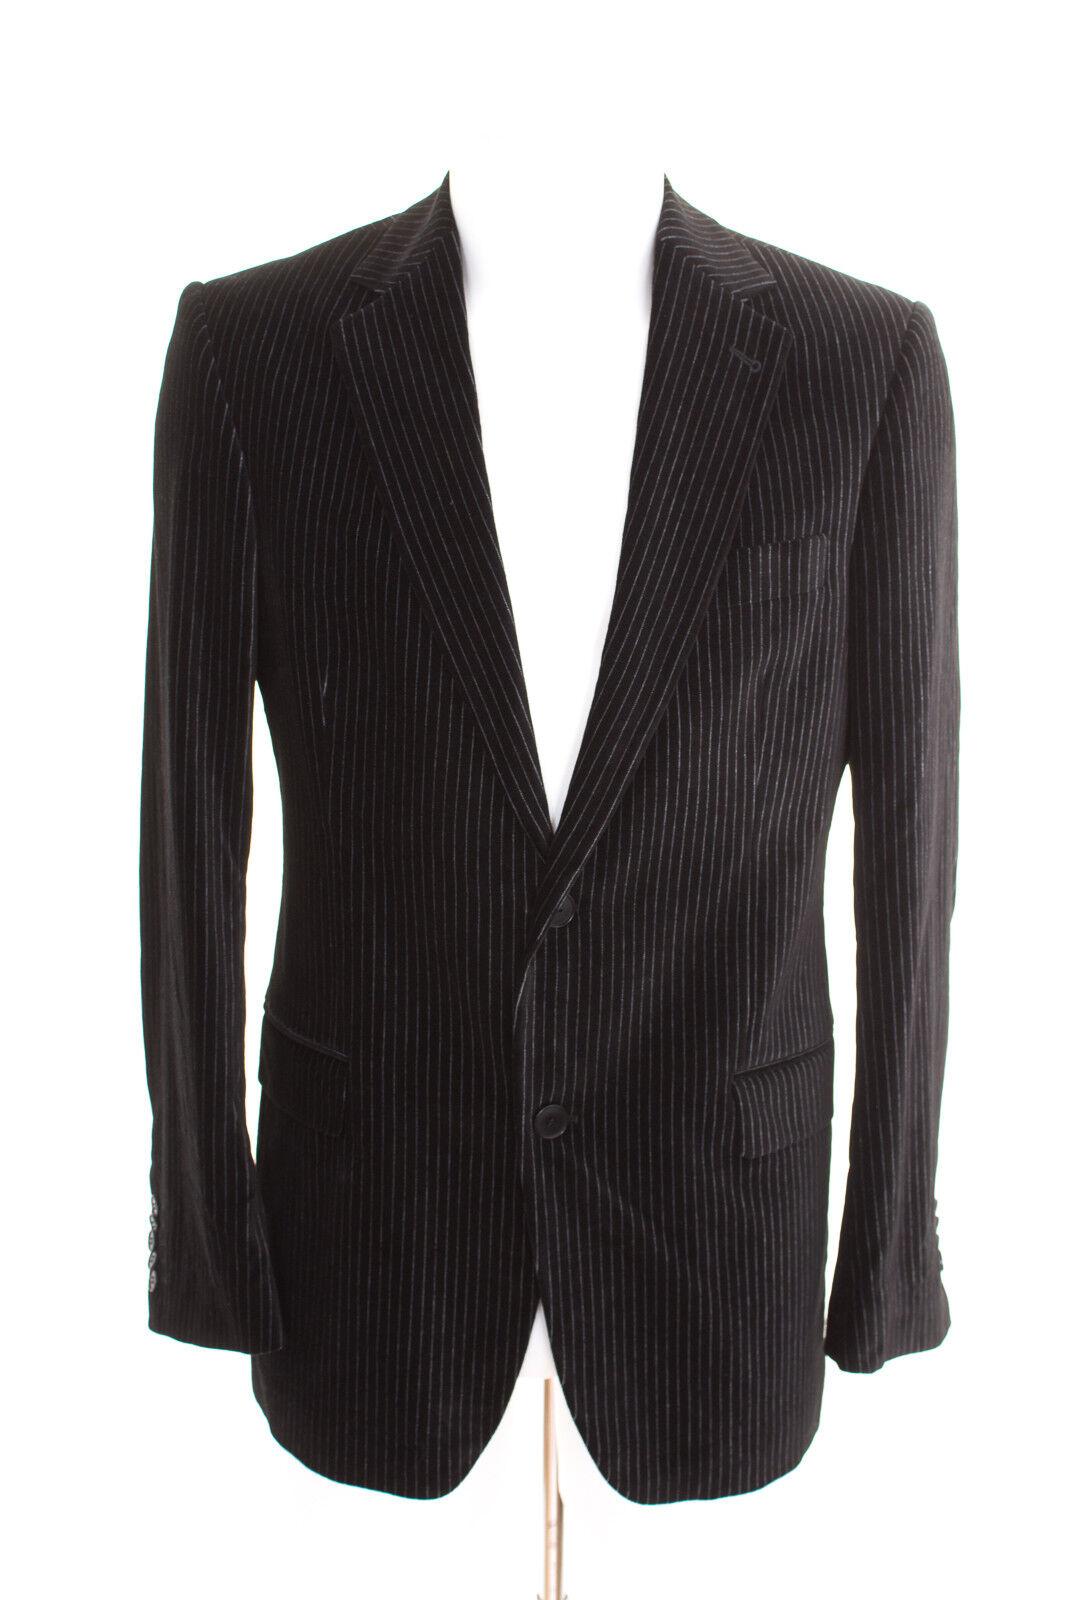 Drykorn For Beautiful People Veste de sport taille 48 comme NEUF samtsakko Affaires veste